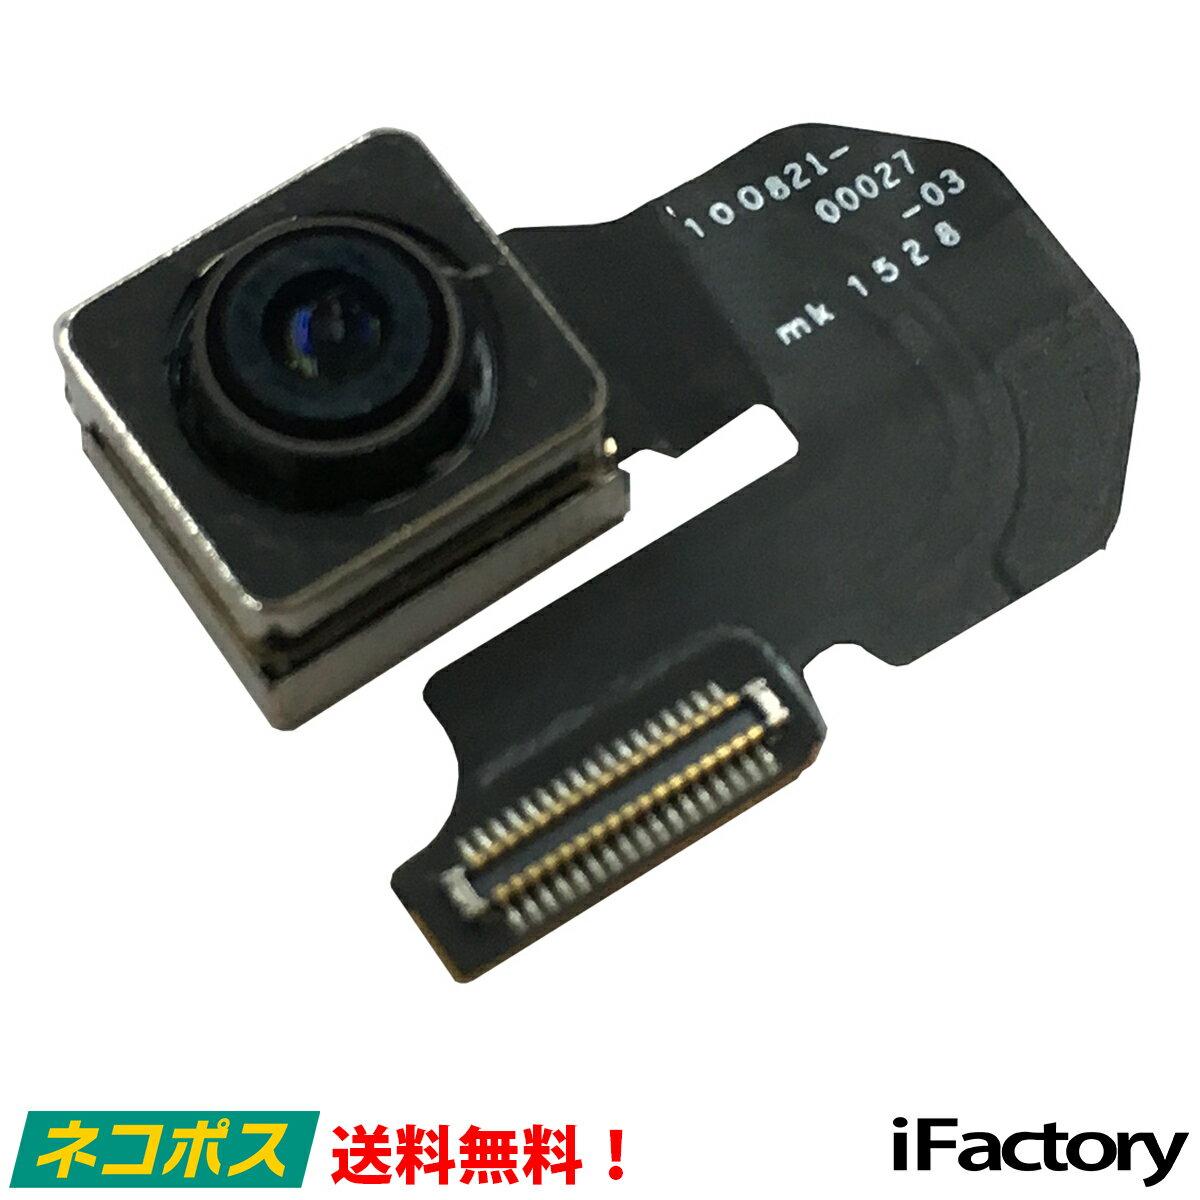 iPhone6s バックカメラ/メインカメラ 修理 交換用リペアパーツ 新入荷